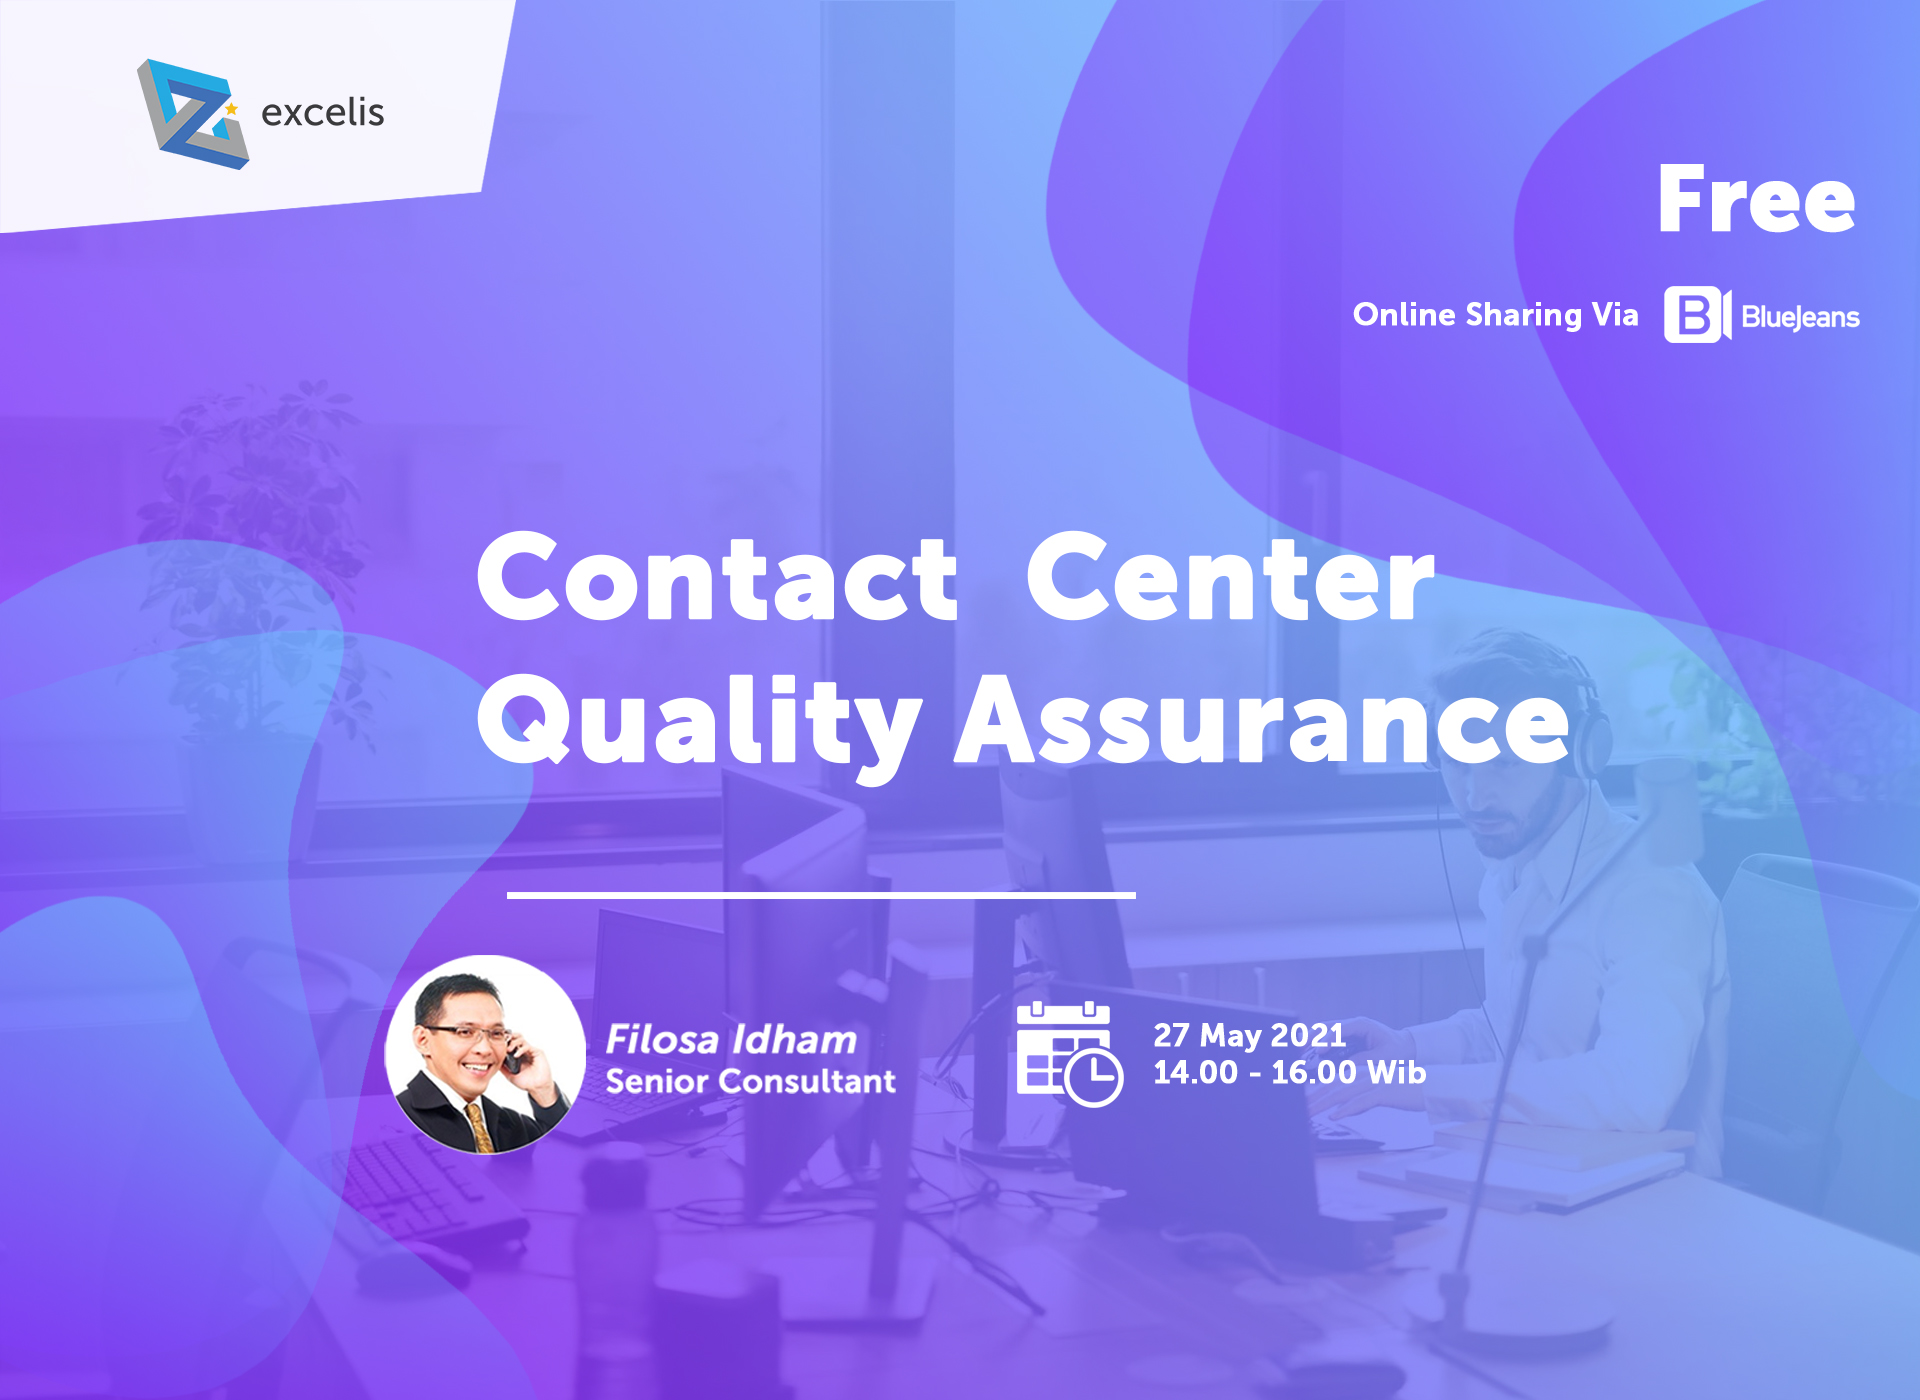 Contact Center Quality Assurance